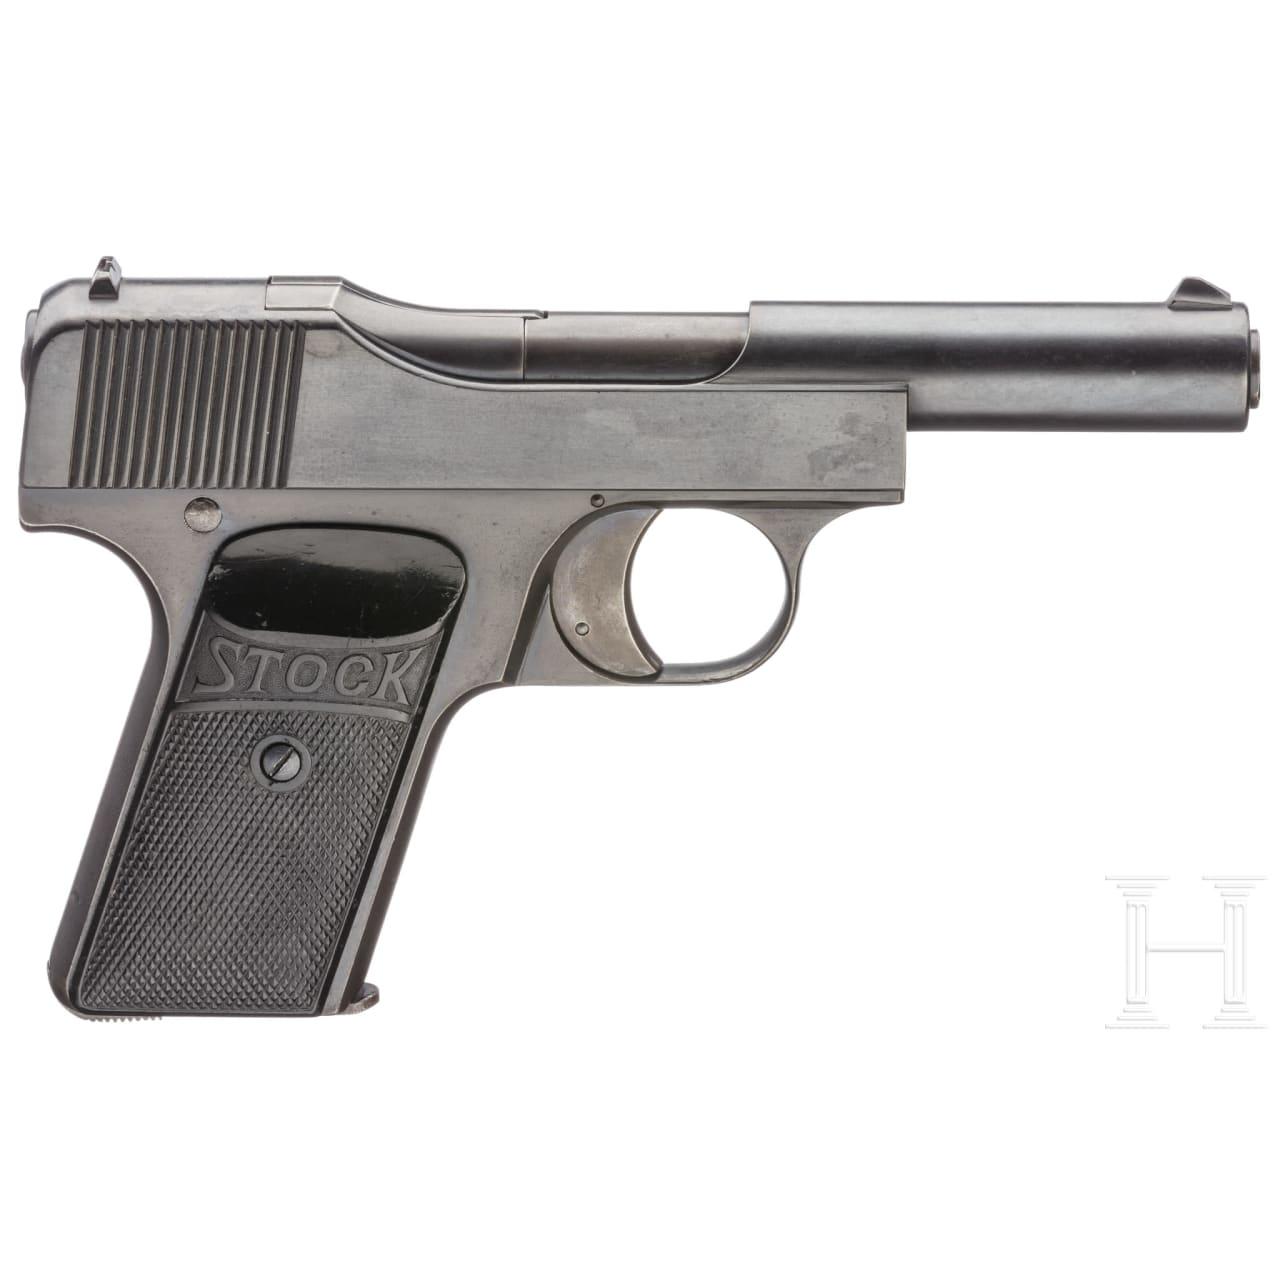 Stock pistol, 1st pattern